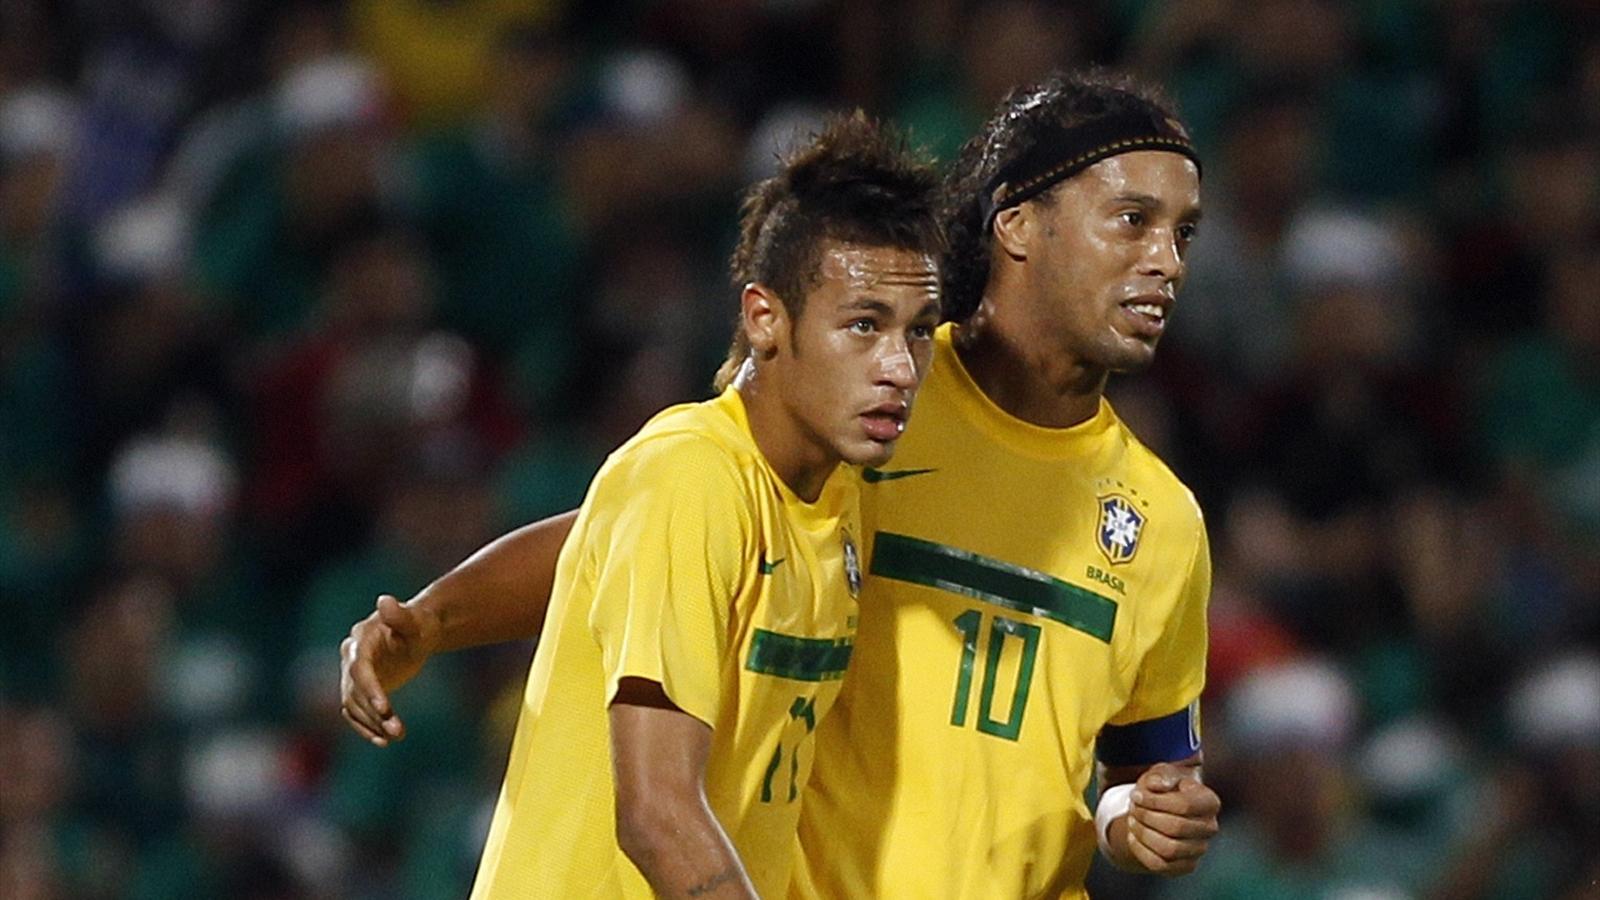 Neymar Vs Ronaldinho 2012 Ronaldinho: Neymar wil...